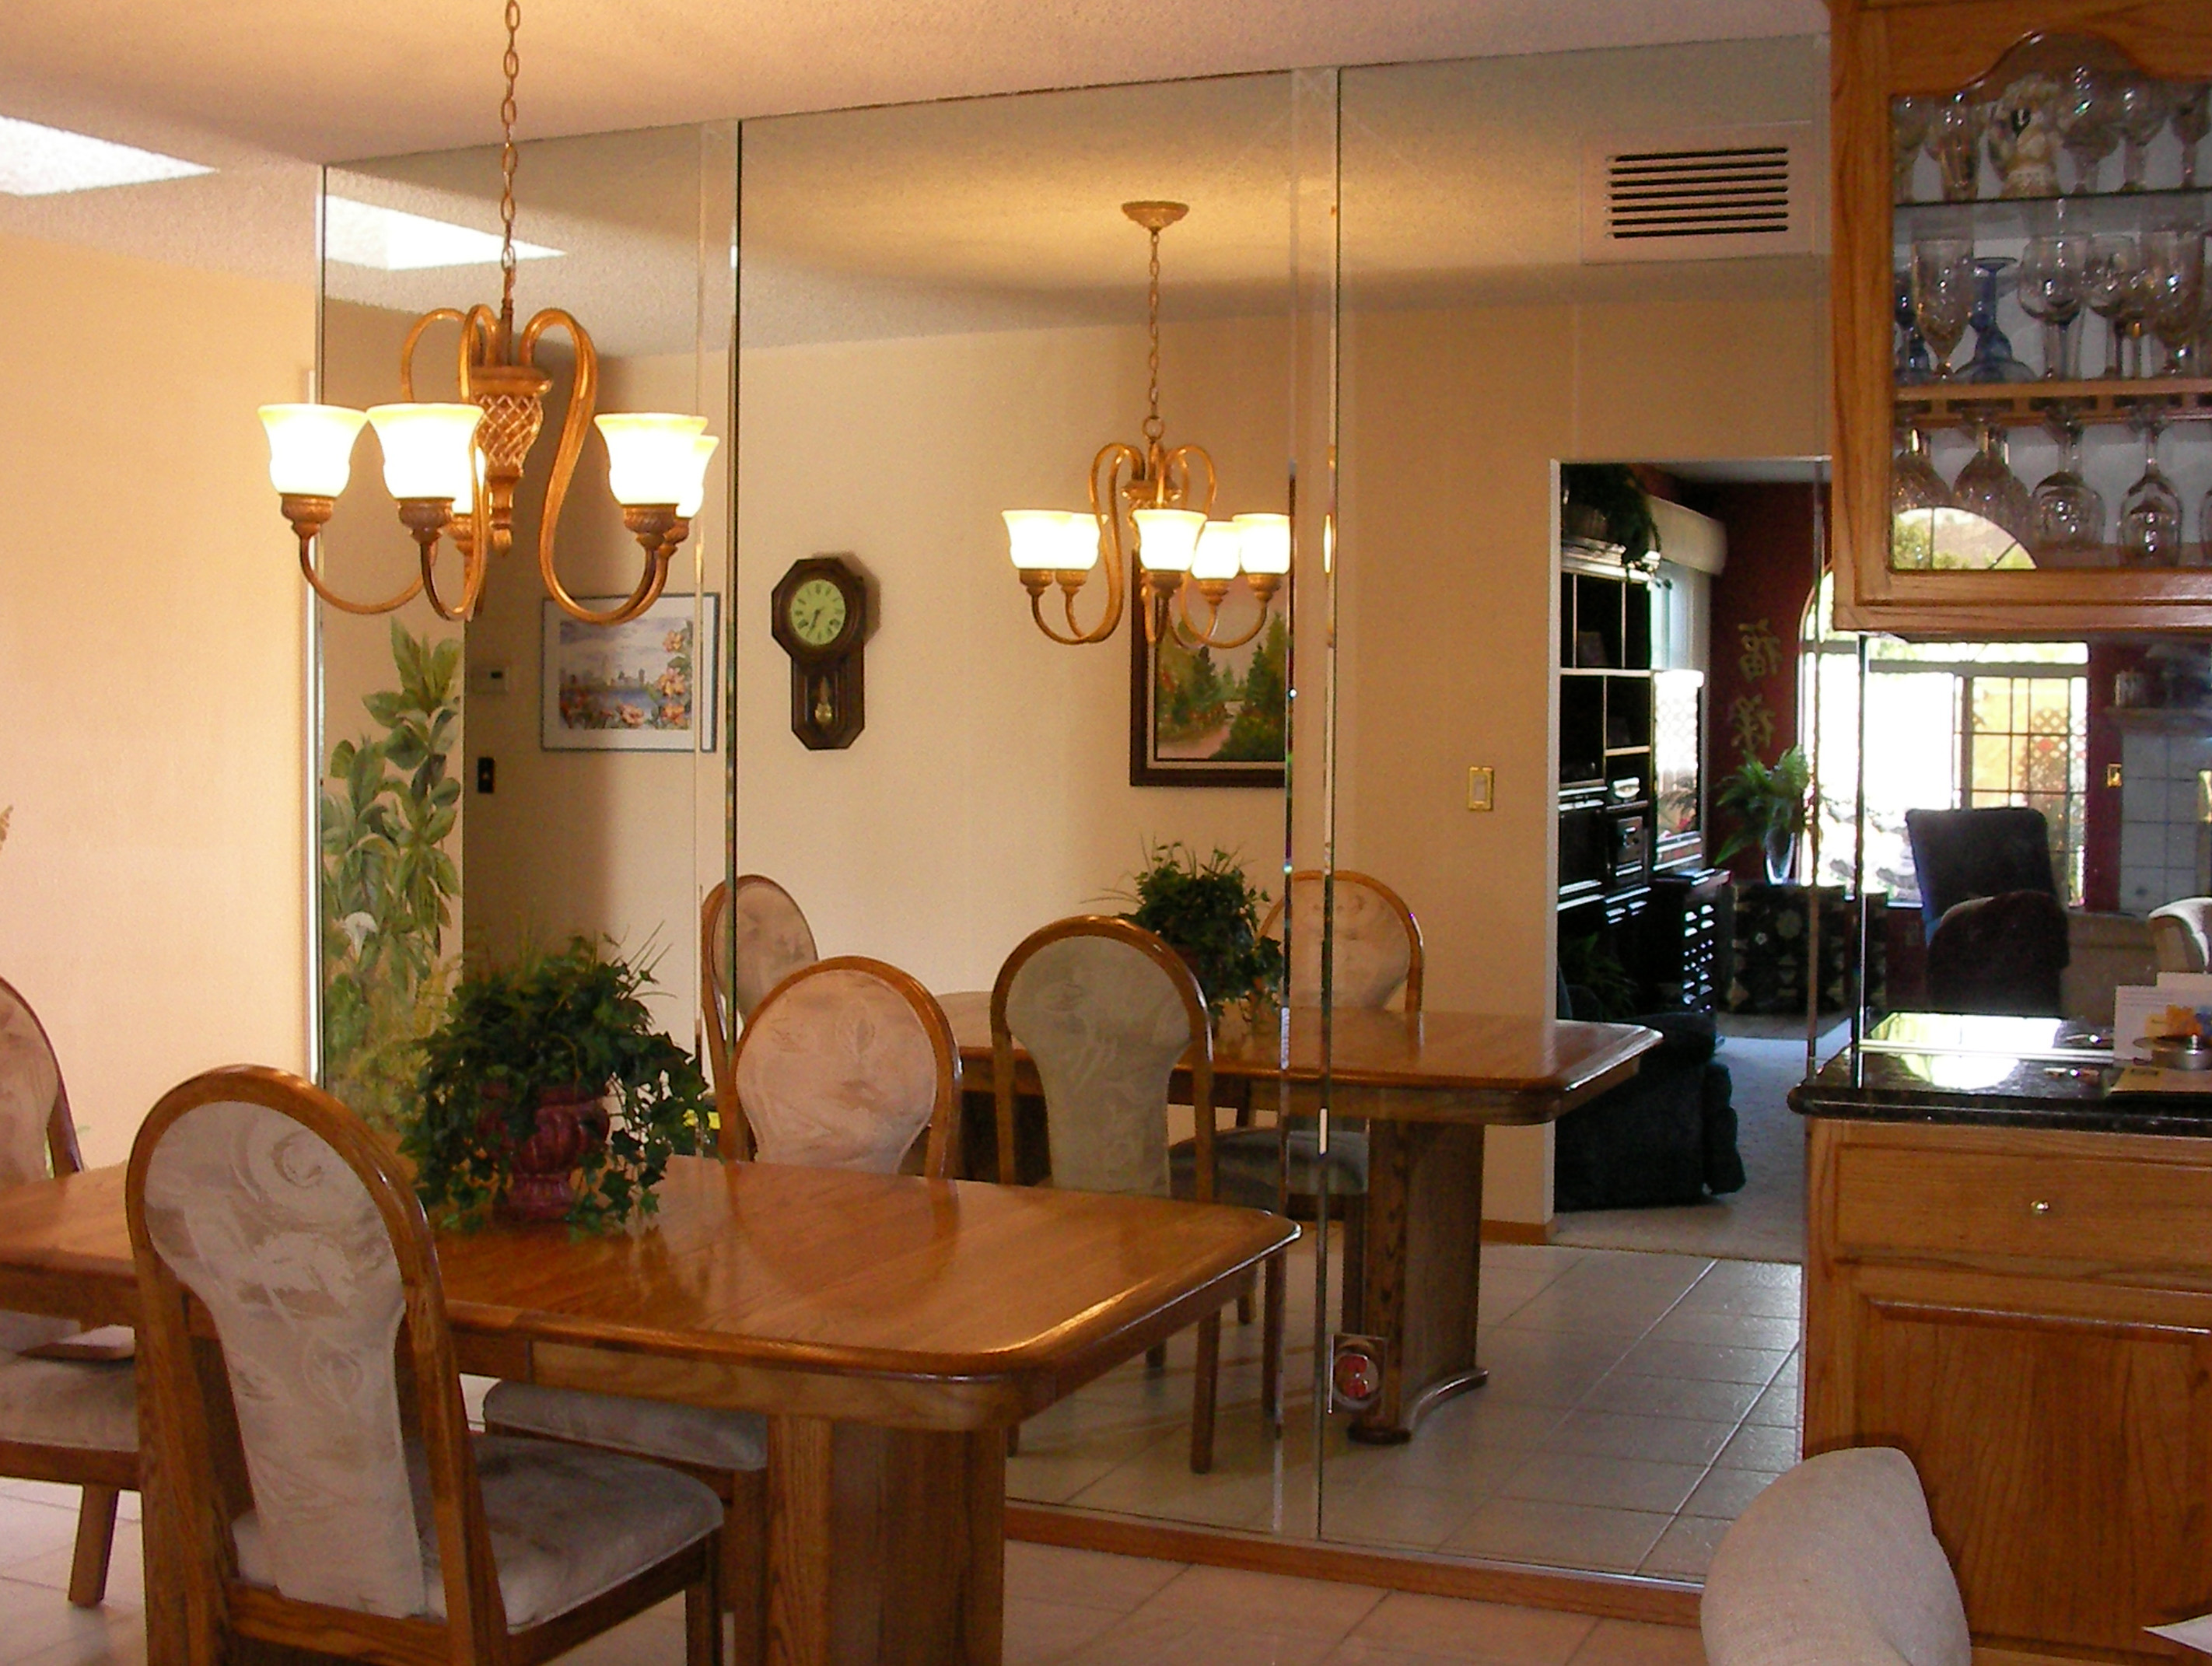 SHOWER DOOR, GLASS, BEST CHOICE | home mirrors